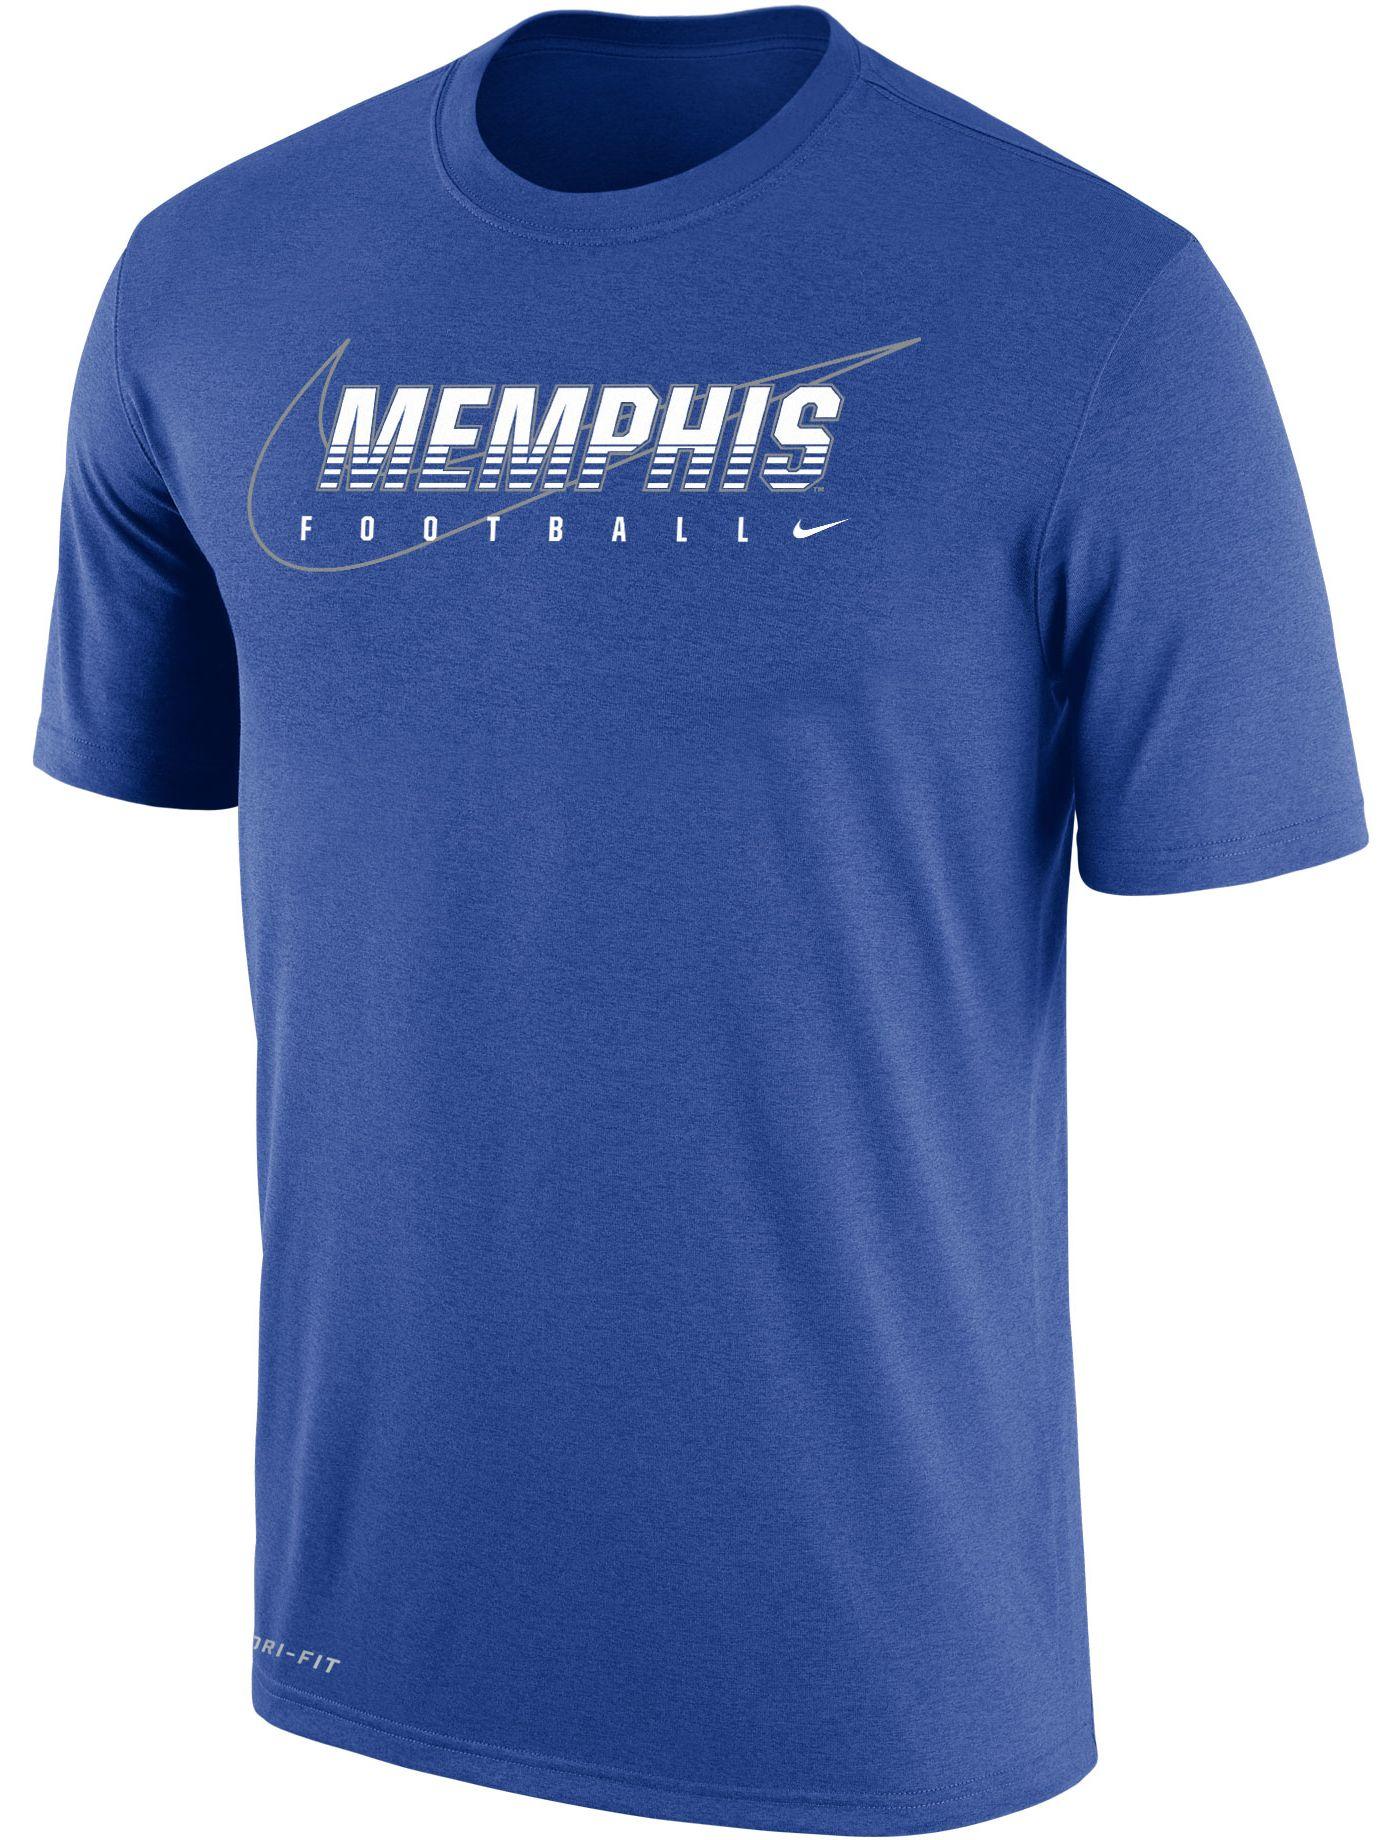 Nike Men's Memphis Tigers Blue Football Dri-FIT Cotton Facility T-Shirt